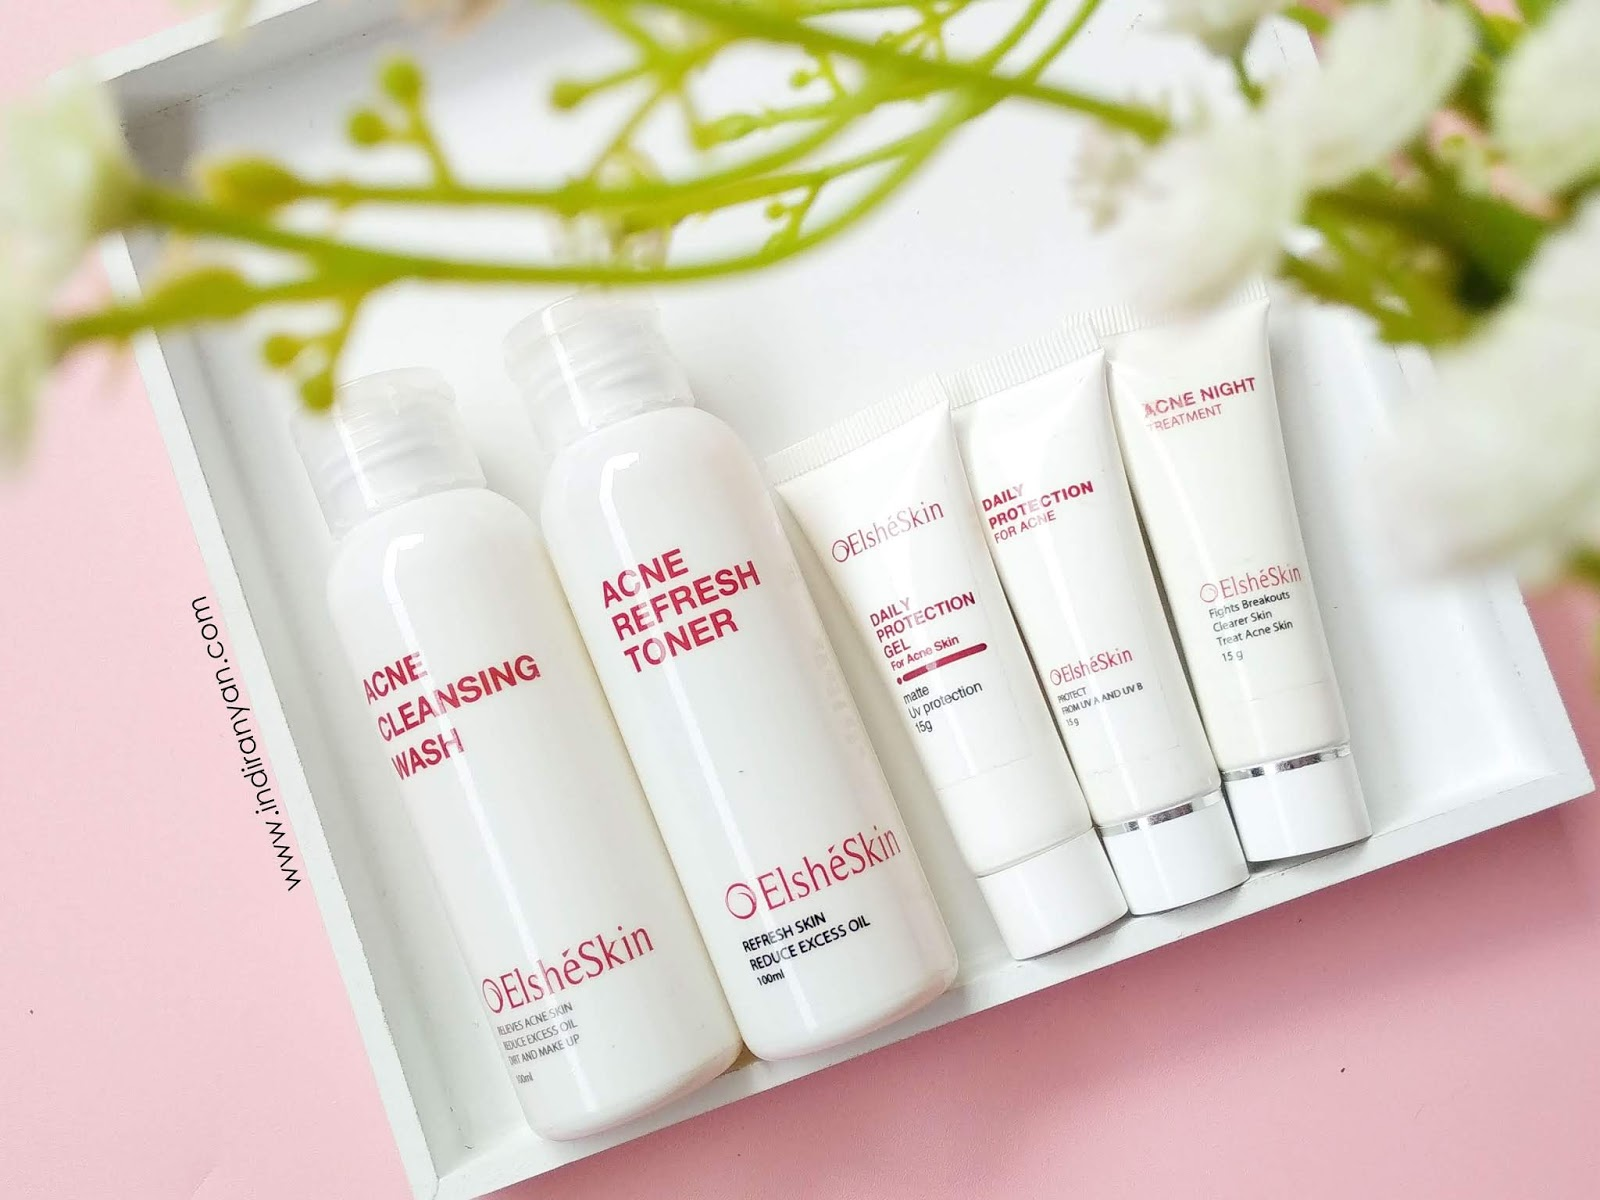 review-elsheskin, elsheskin-untuk-kulit-berjerawat, elsheskin-acne-treatment-series